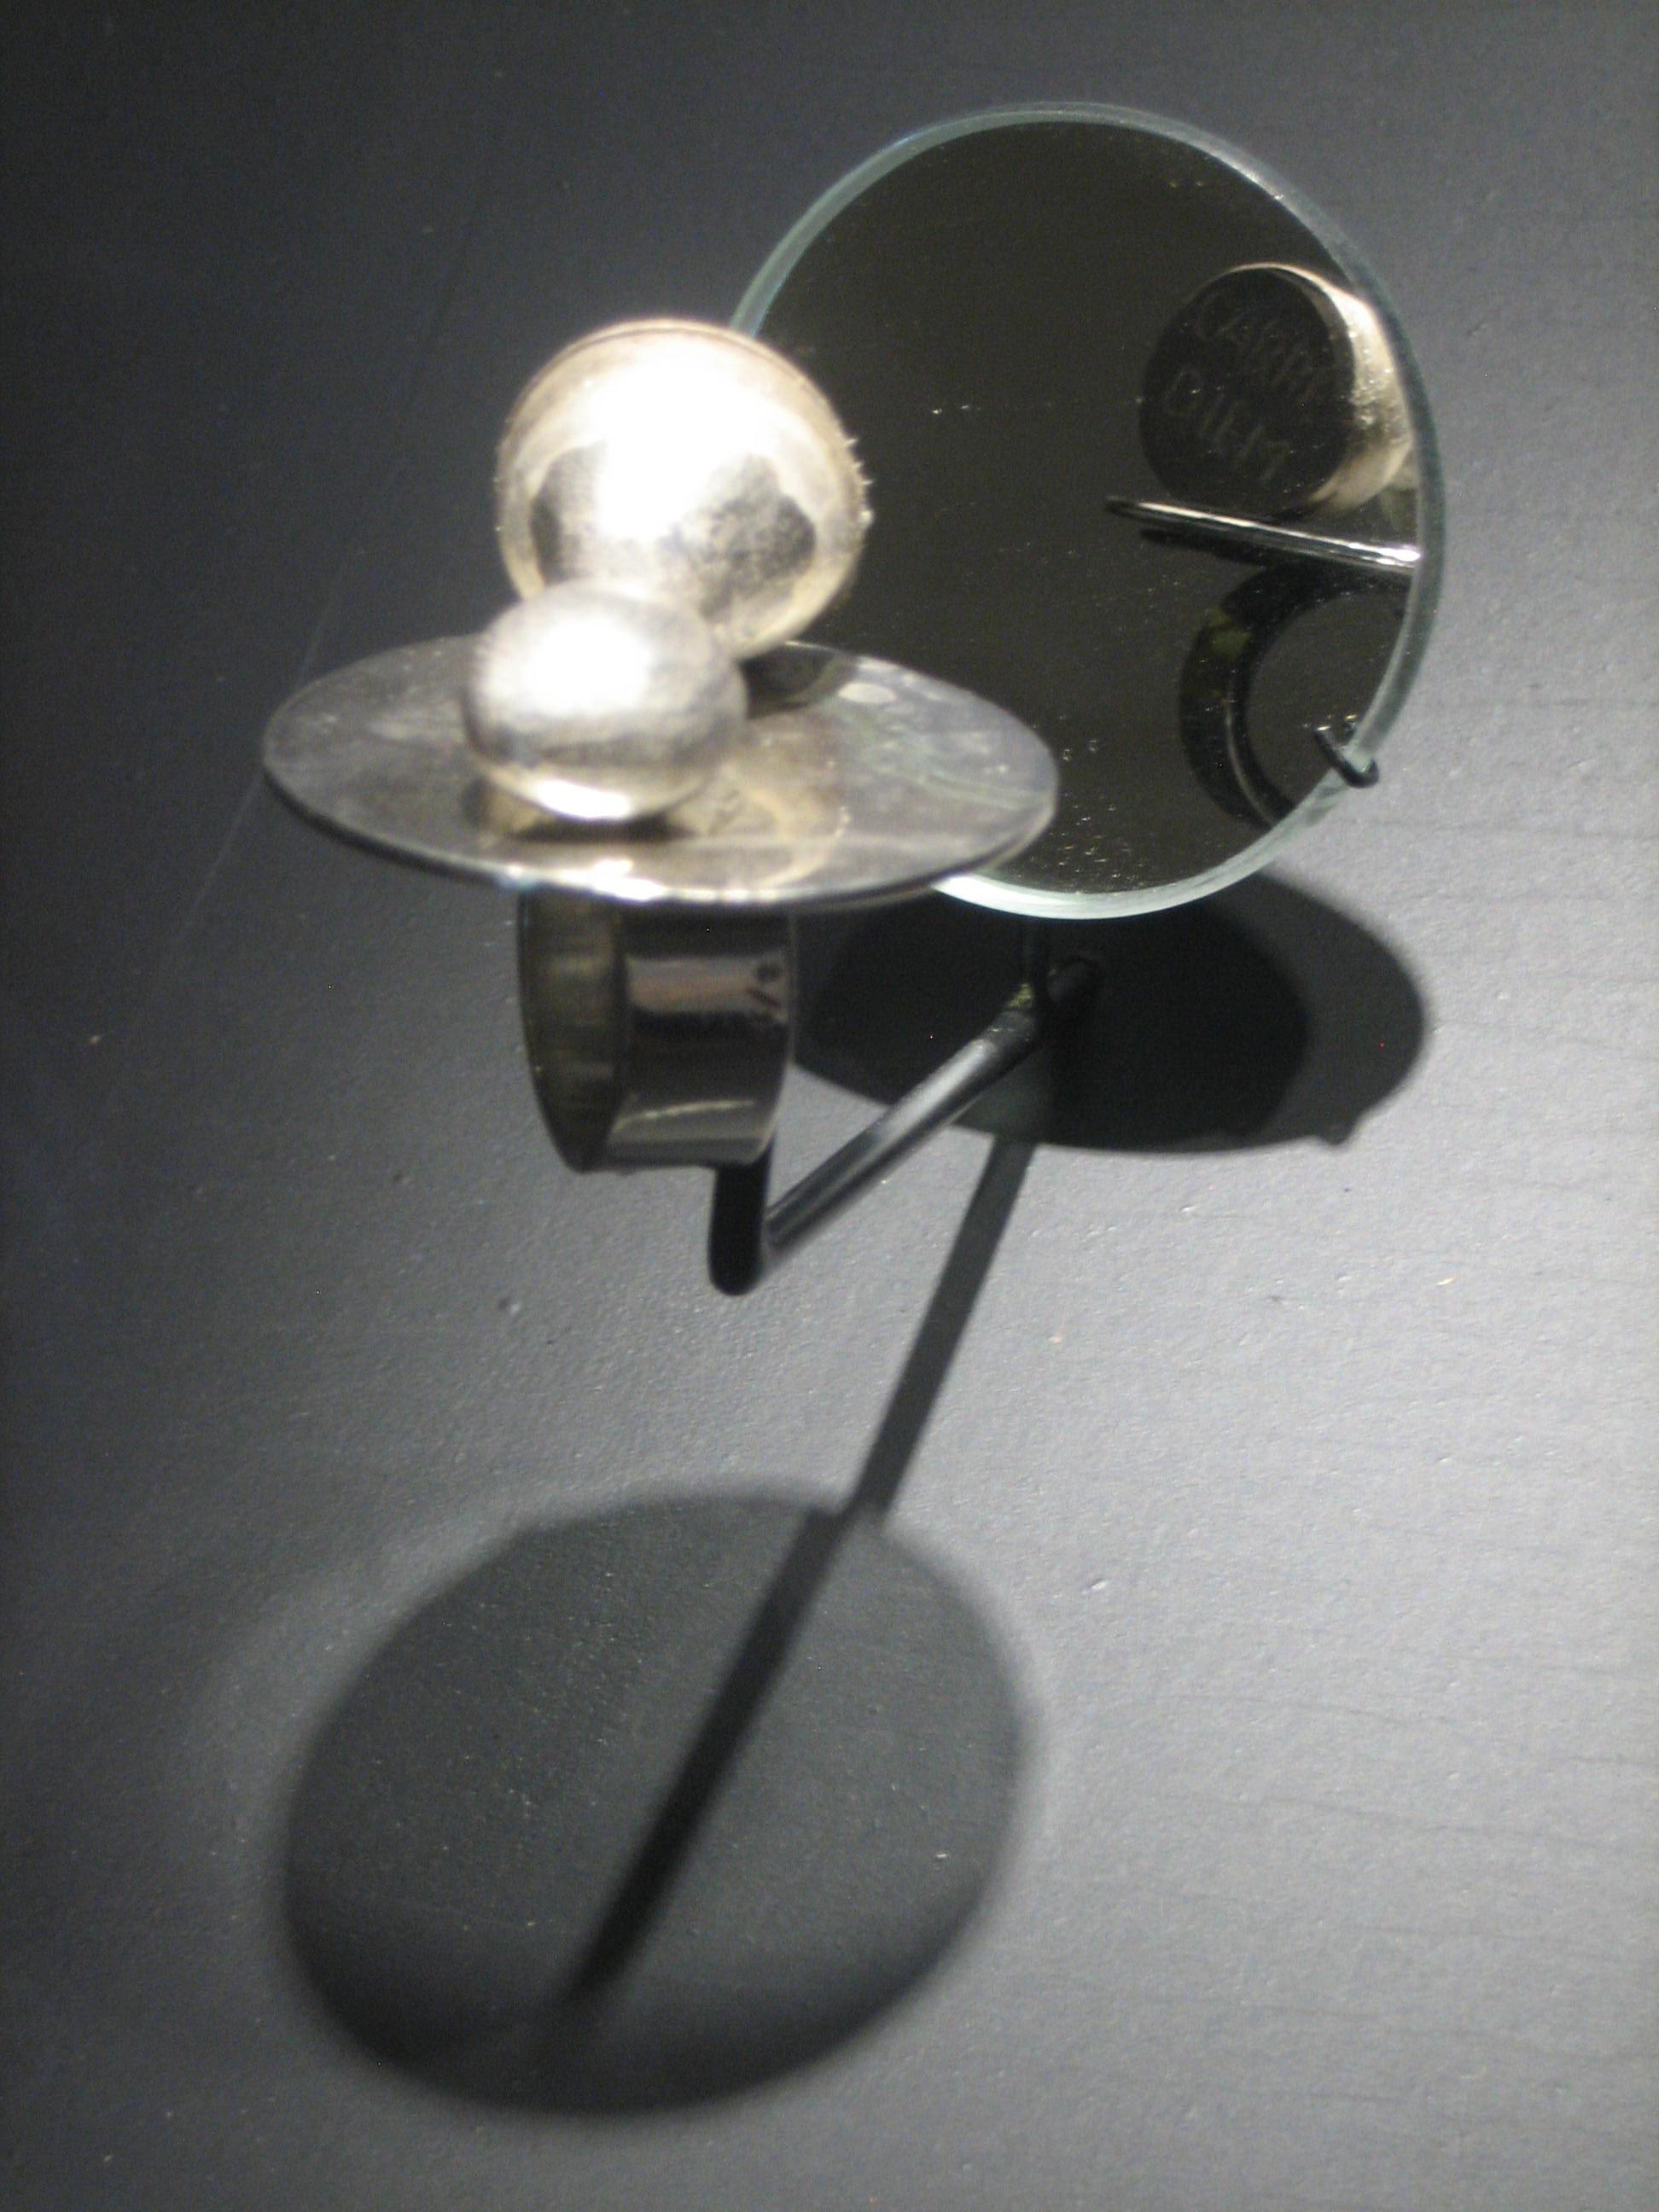 Barthélémy Toguo, Carpe diem, ring, 2013, 2/8. Collectie Diane Venet. Foto Esther Doornbusch, juni 2018©